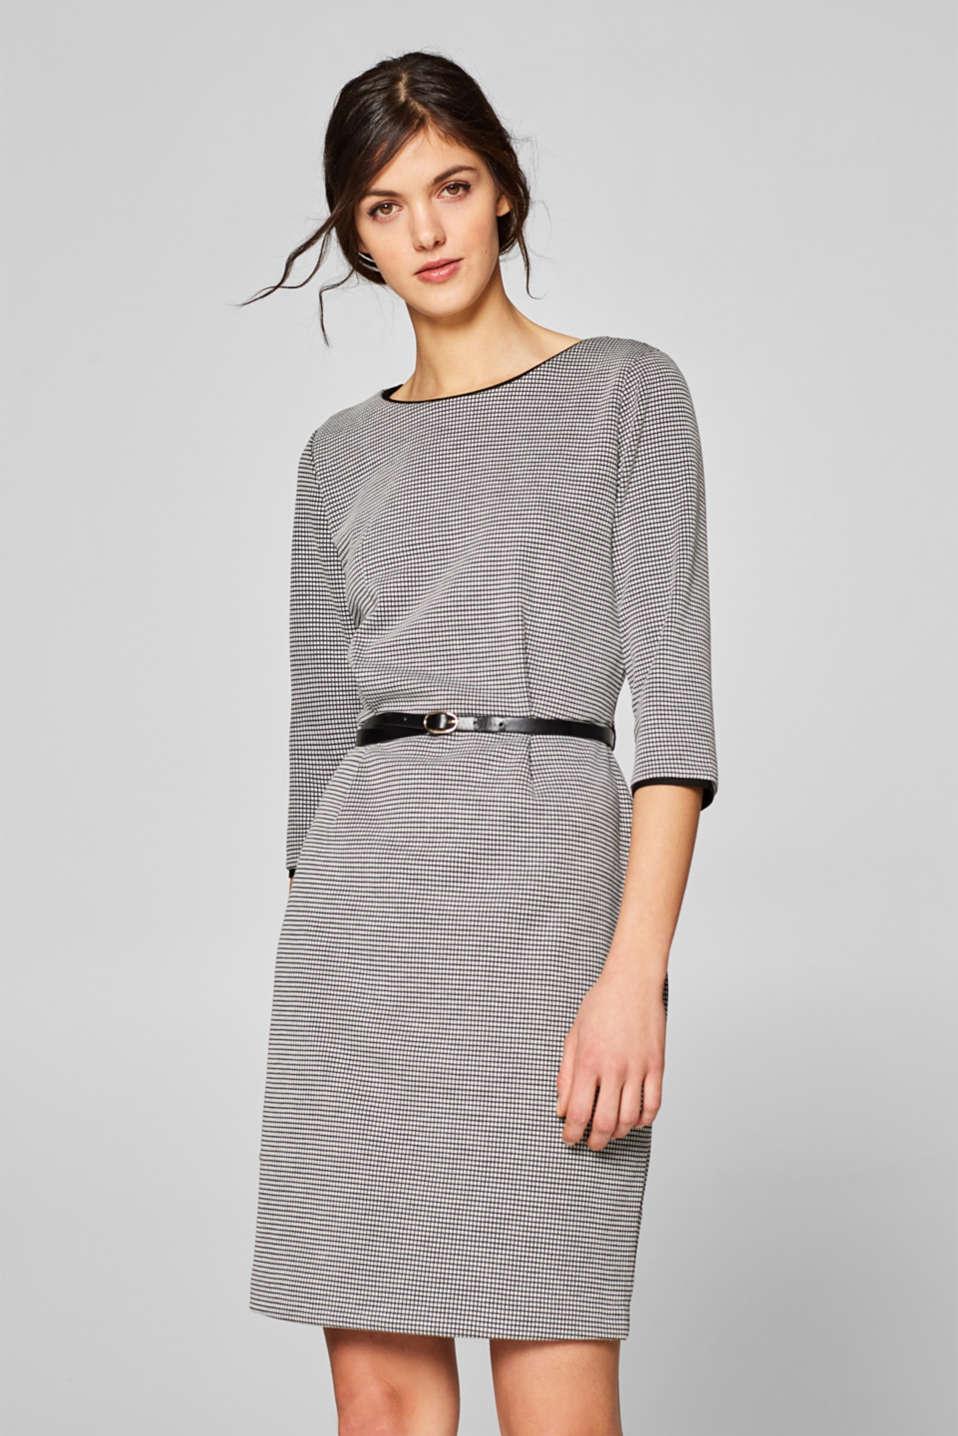 861775b8e3e1 Esprit - Ternet jerseystretch-kjole med bælte i Esprits Online-Shop